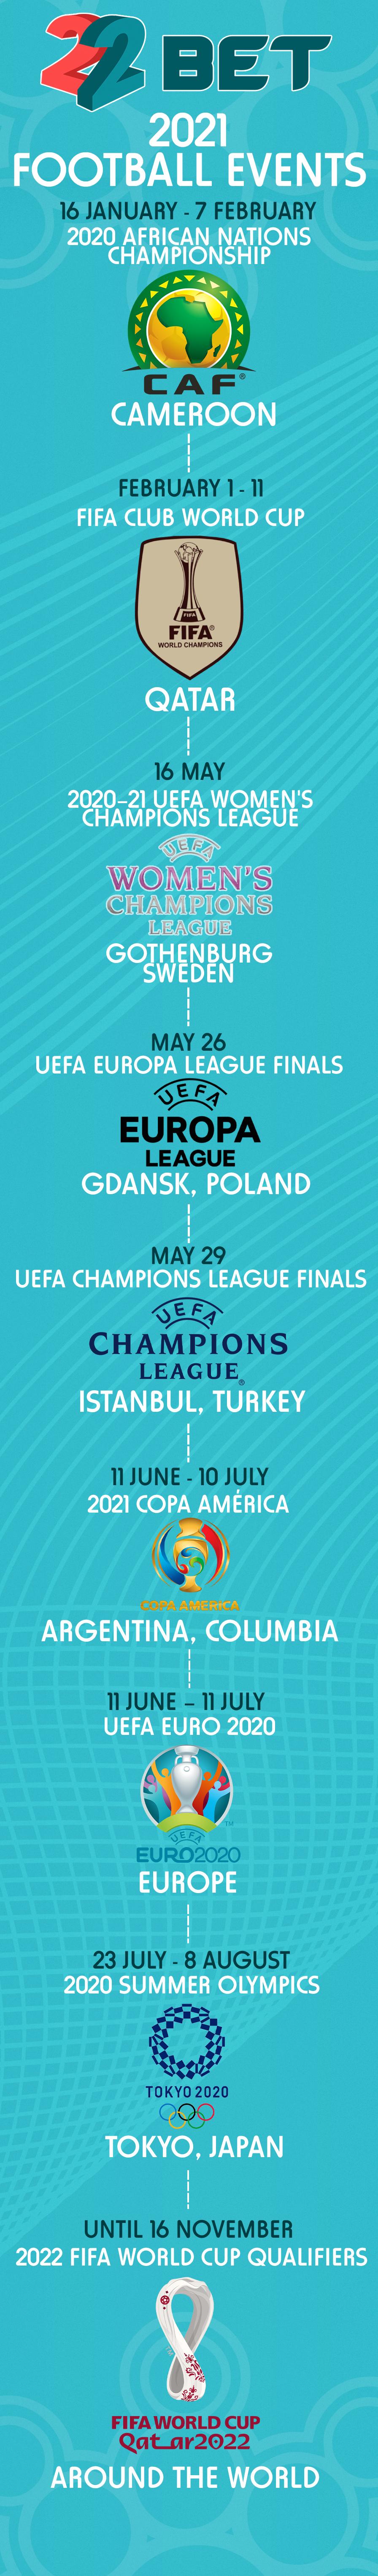 Major football tournaments of 2021